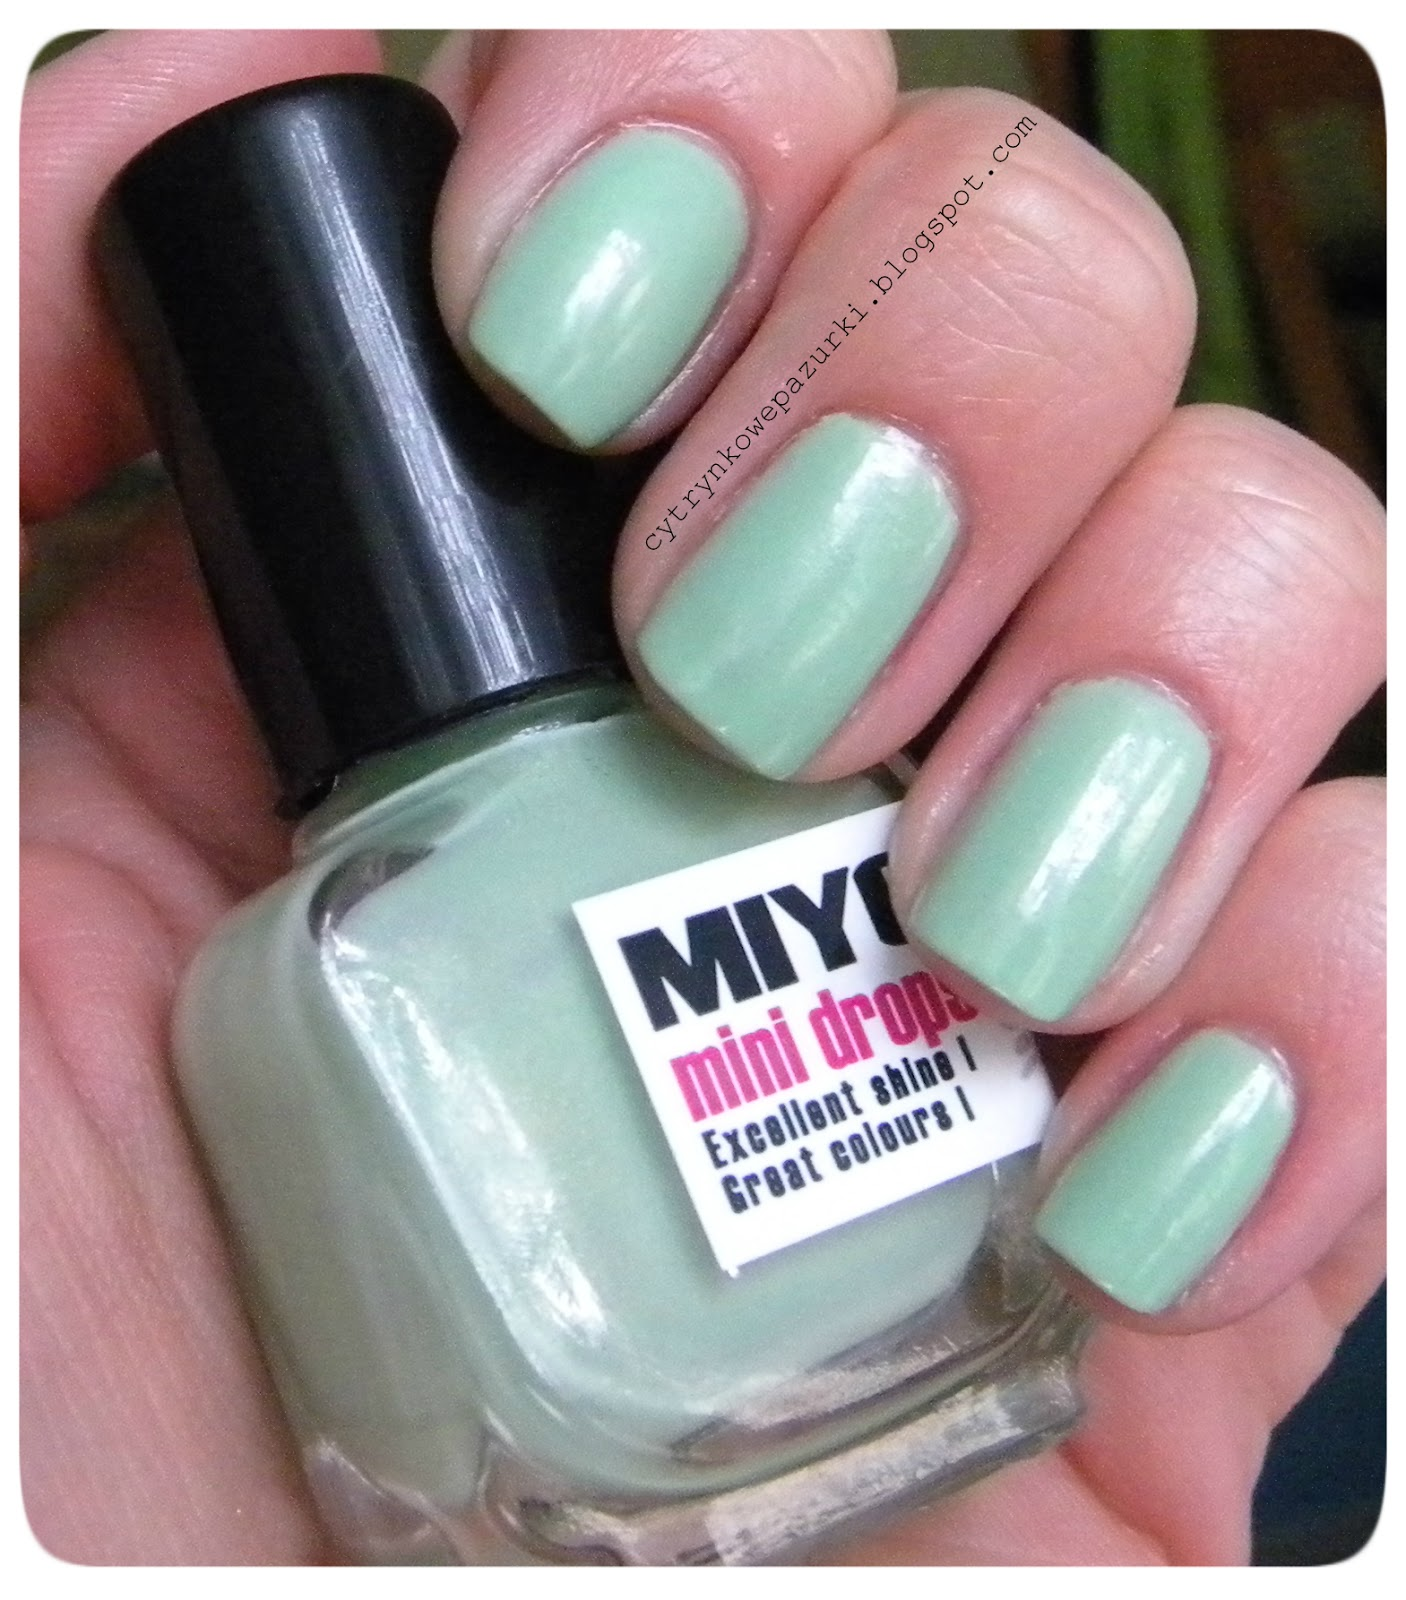 Miyo Mini Drops 43 Mint lakier zapachowy